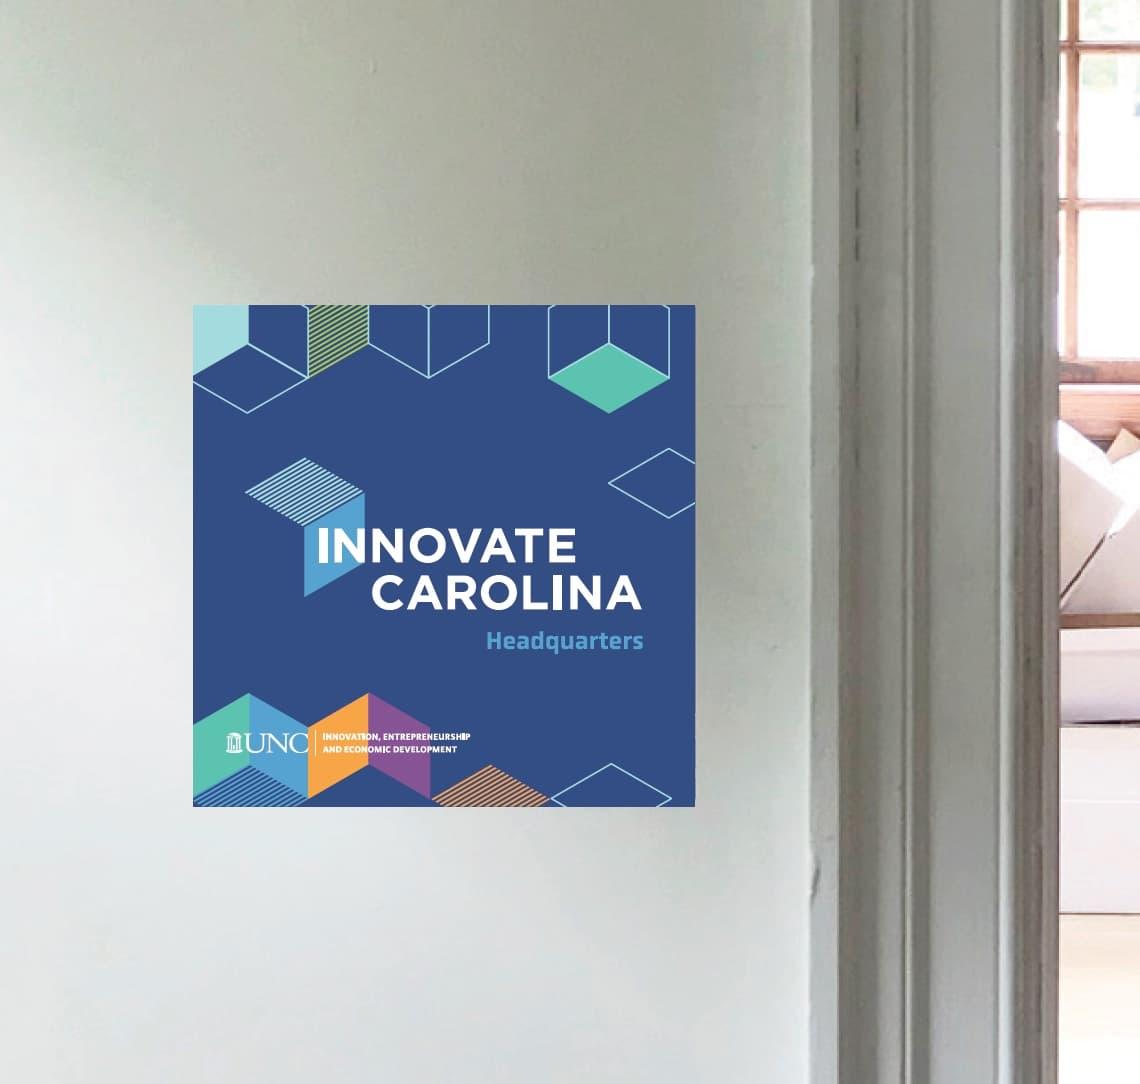 Innovate Carolina building sign